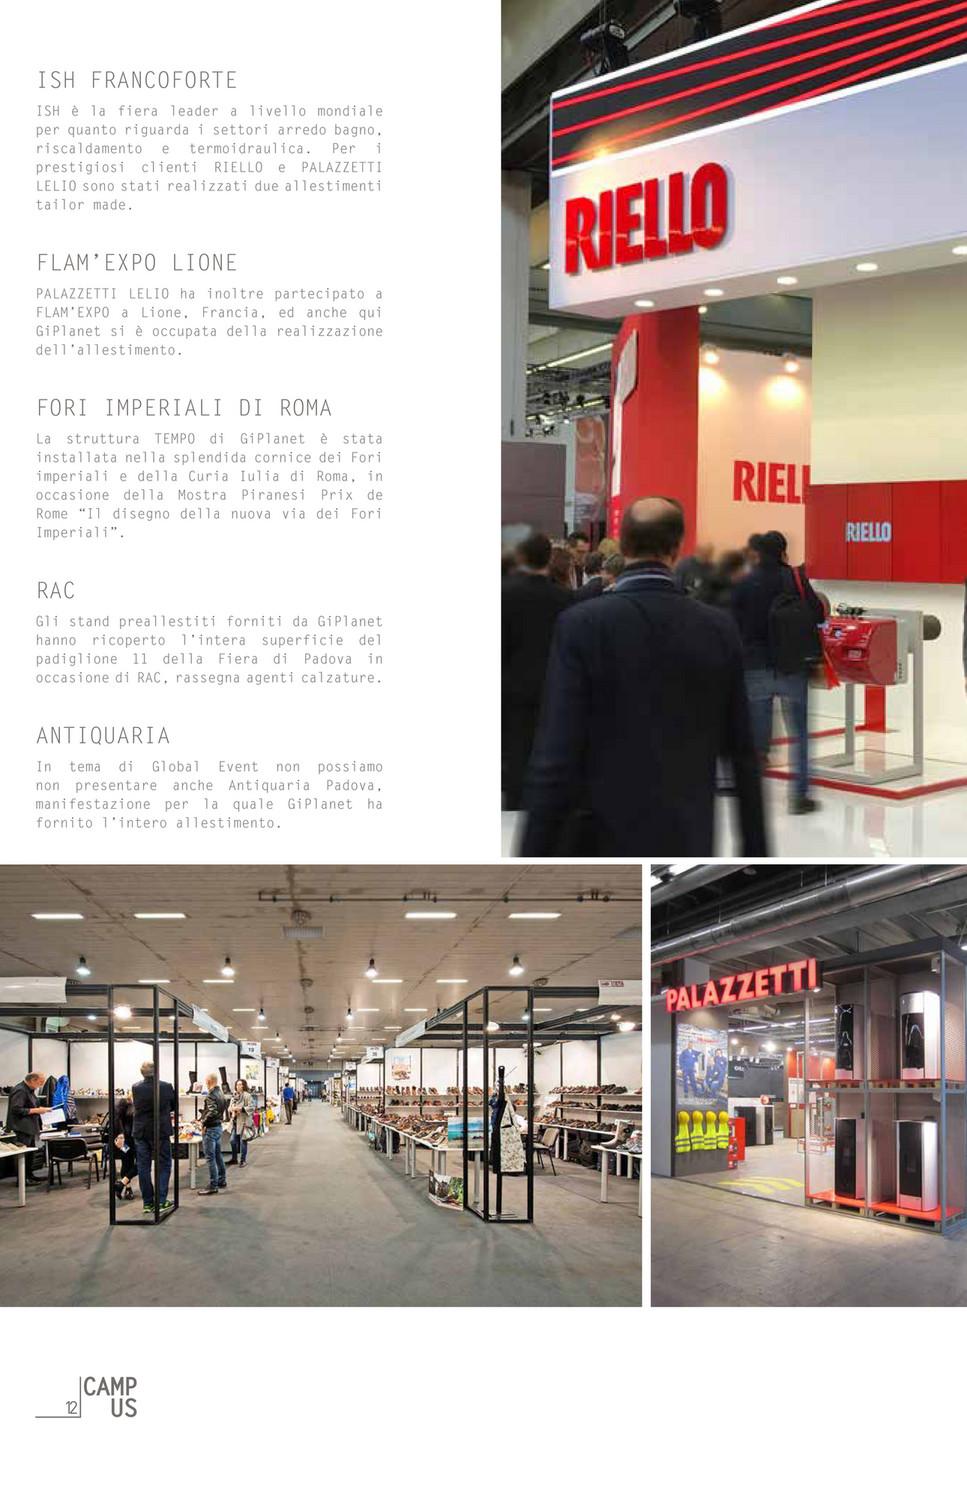 Arredo Bagno Expo Roma.Campus N 3 Marzo 2017 Pagina 12 13 Created With